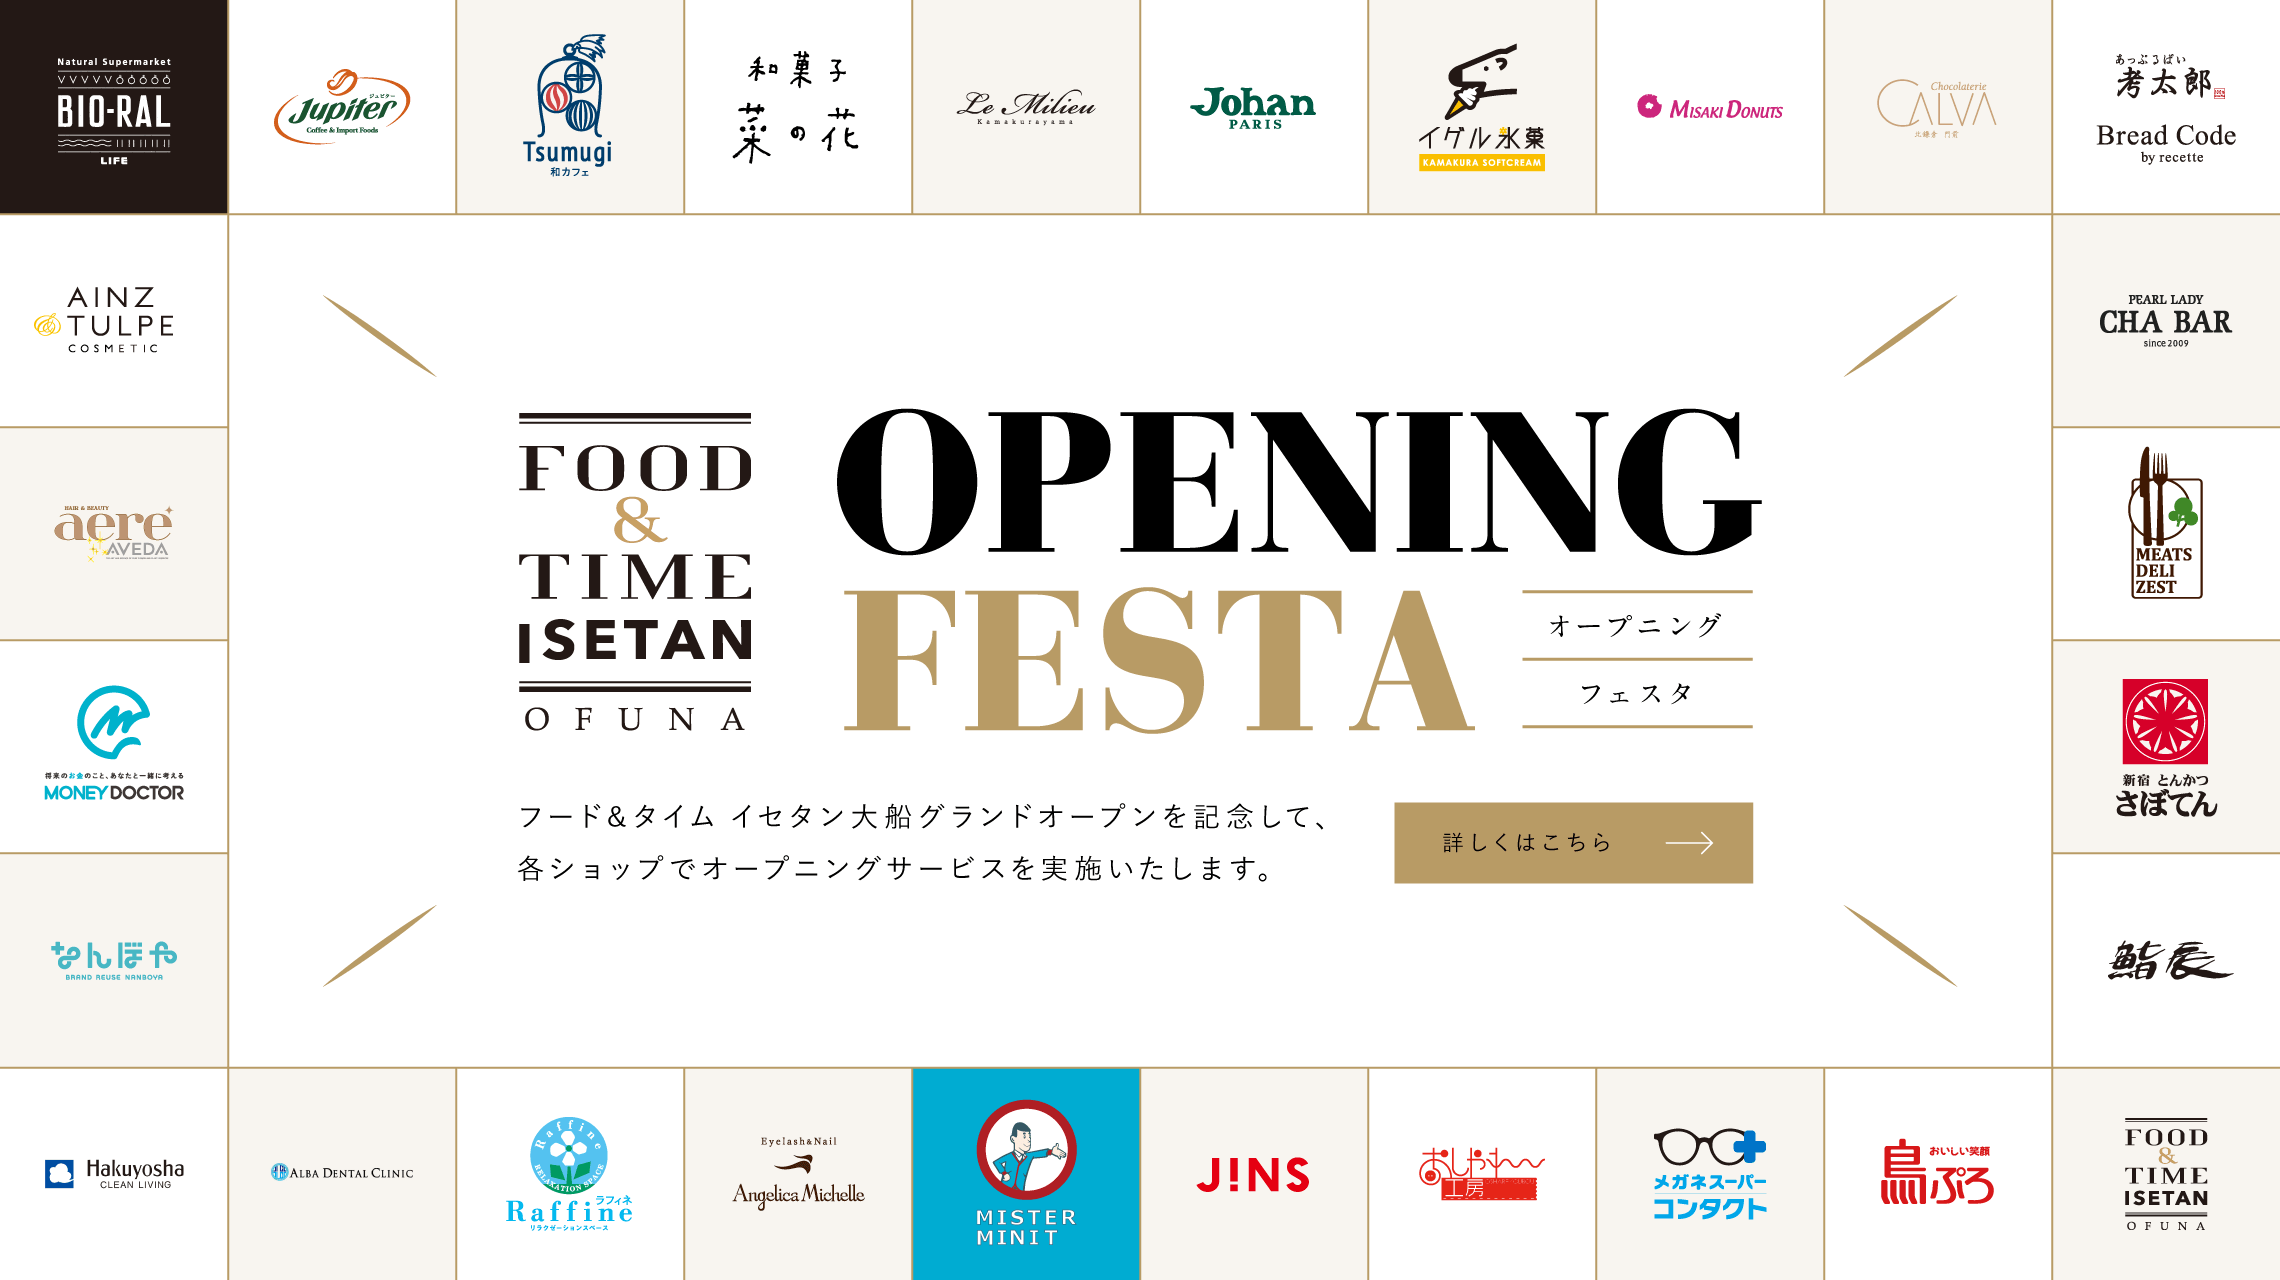 OPENING FESTA